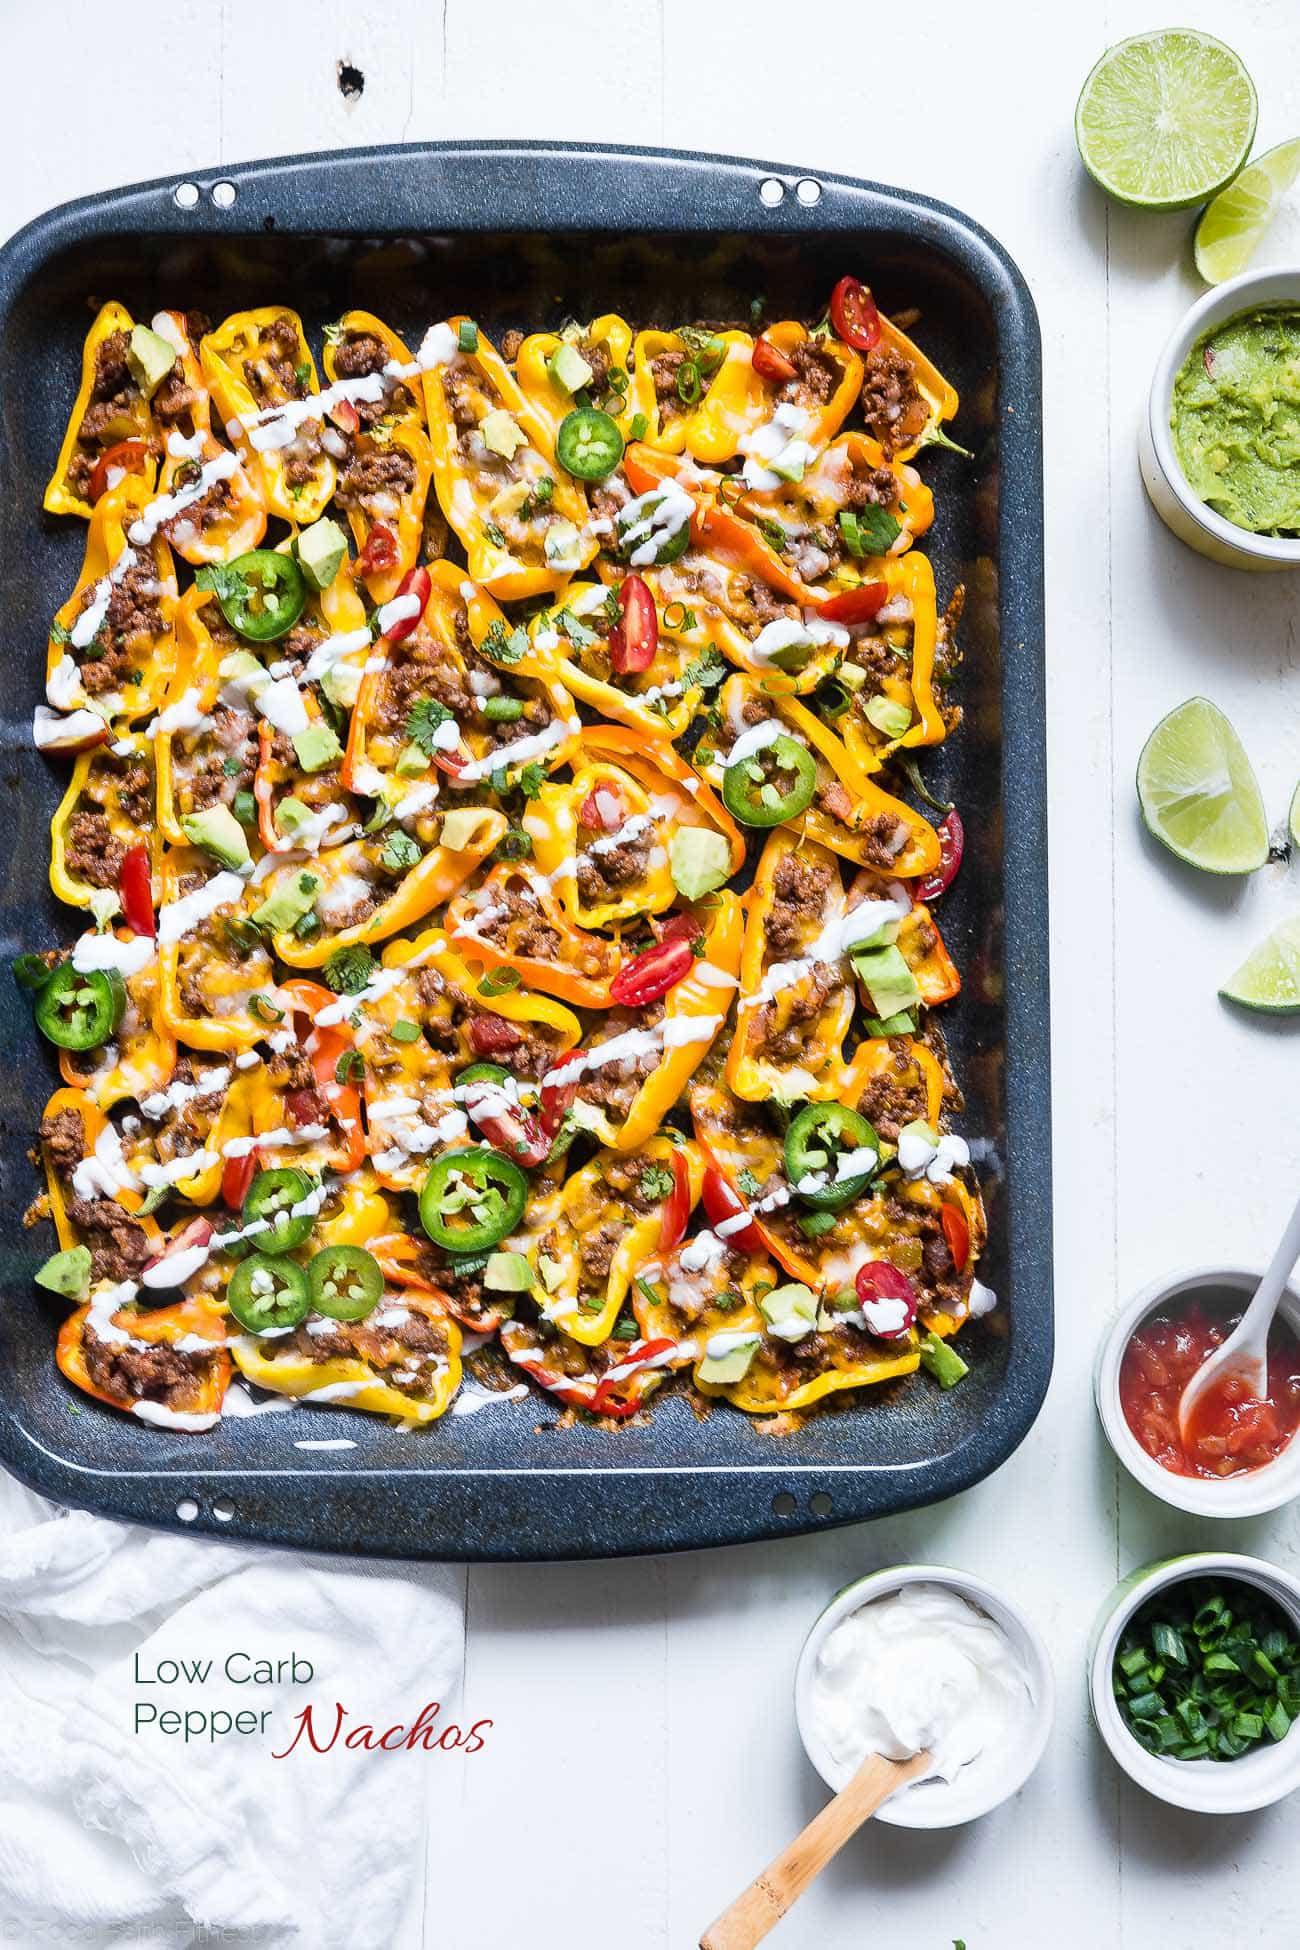 Mini bell pepper nachos on sheet pan. Recipe on Foodfaithfitness.com